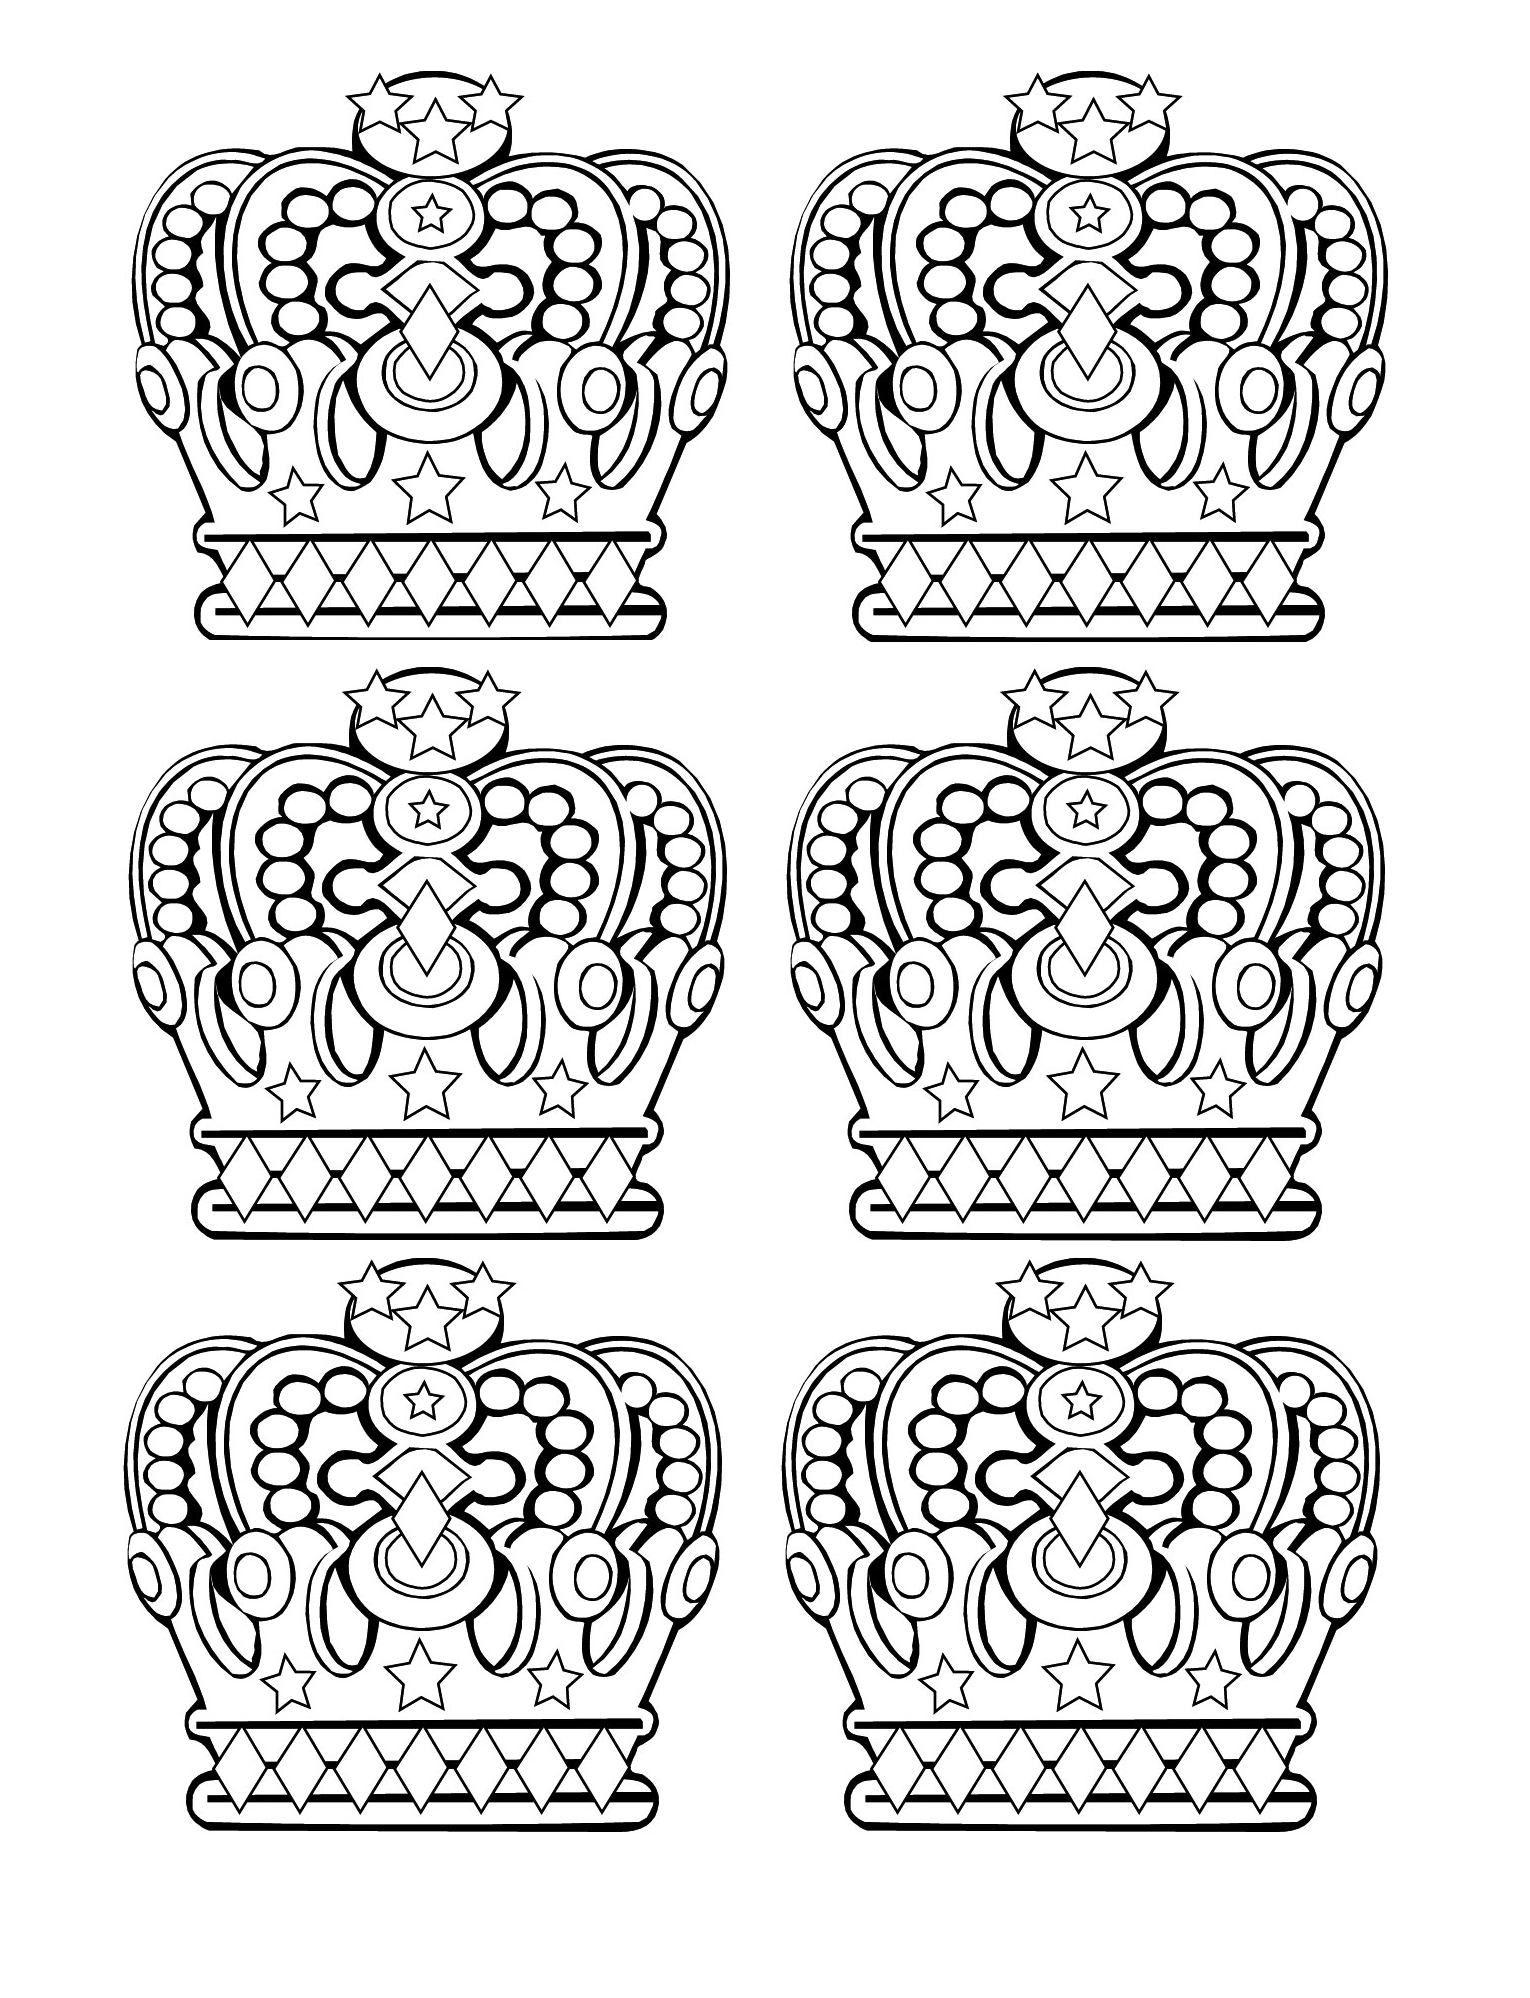 Free coloring page coloring-6-royal-crowns. Royal crowns (6 patterns ...